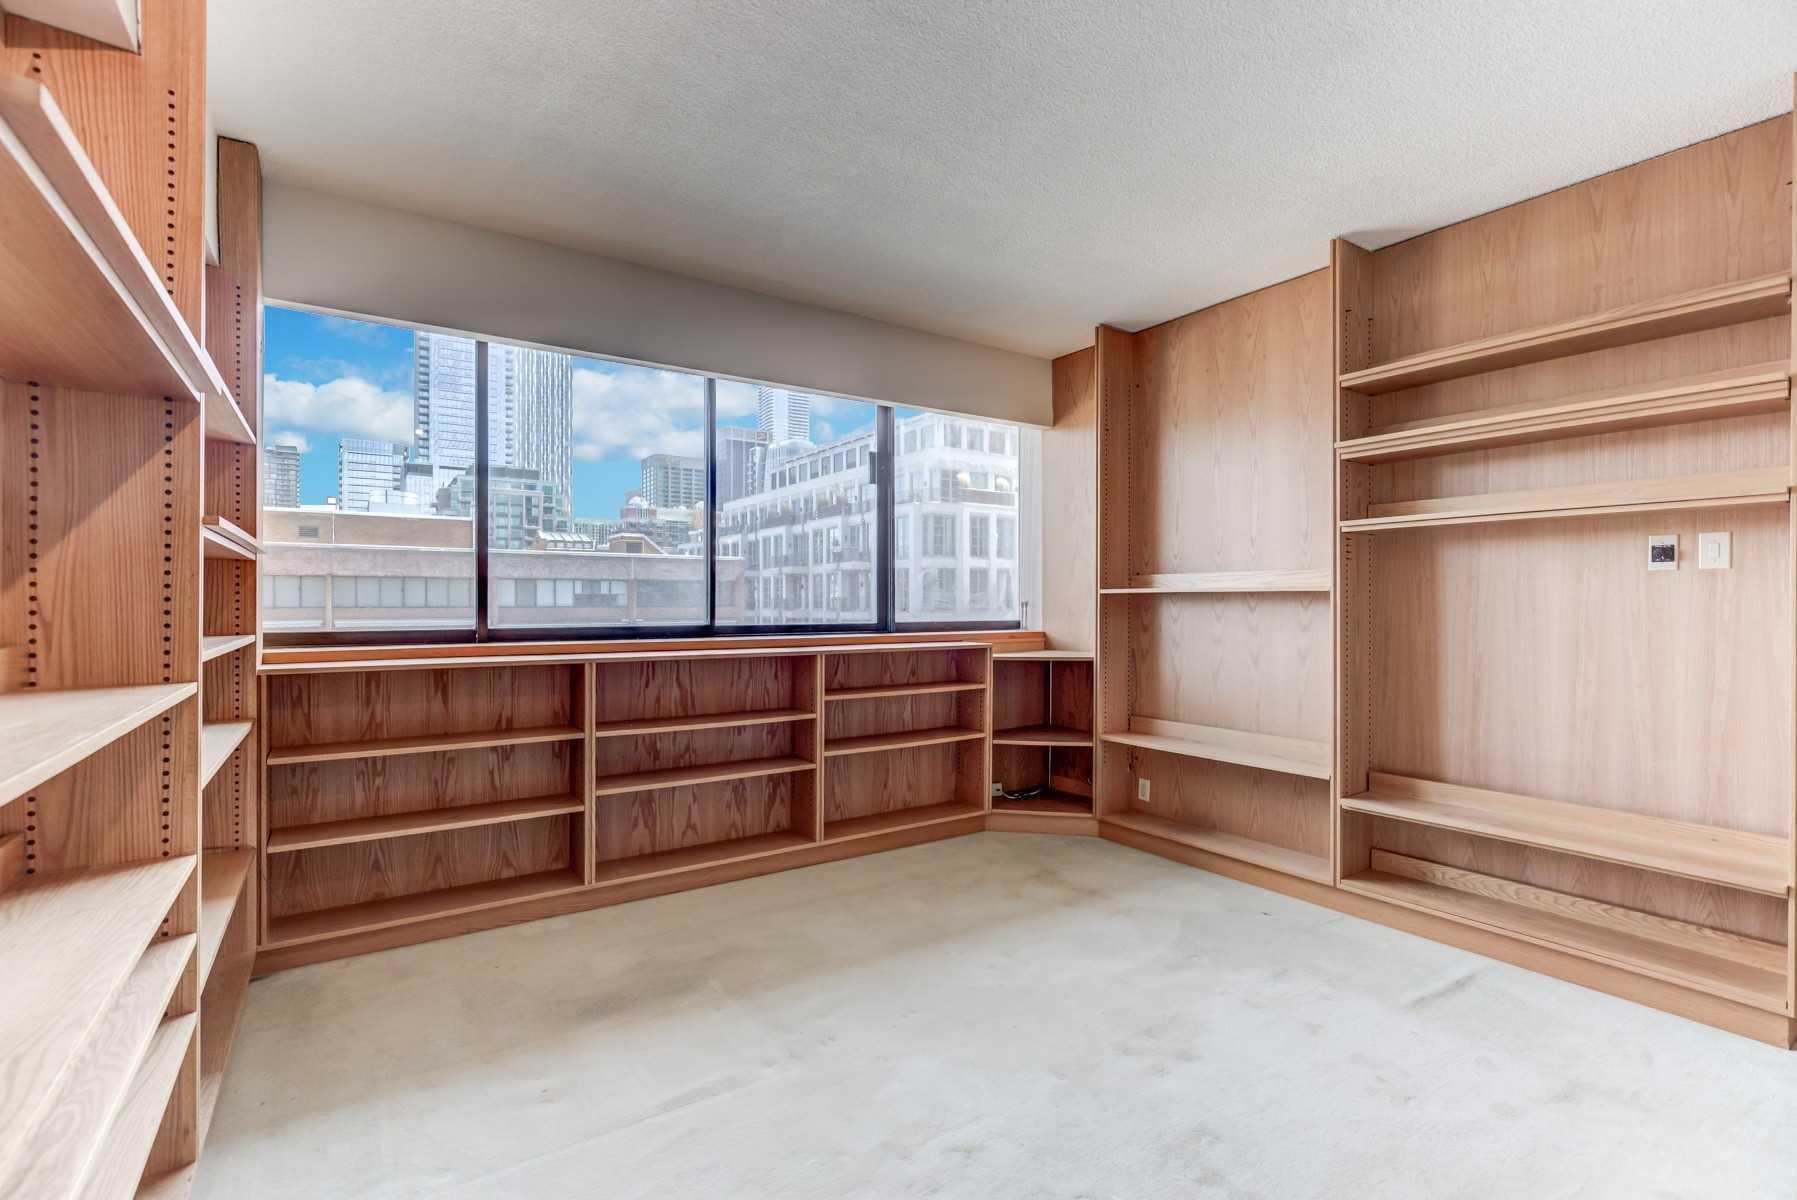 607 - 55A Avenue Rd - Annex Condo Apt for sale, 2 Bedrooms (C5185690) - #22